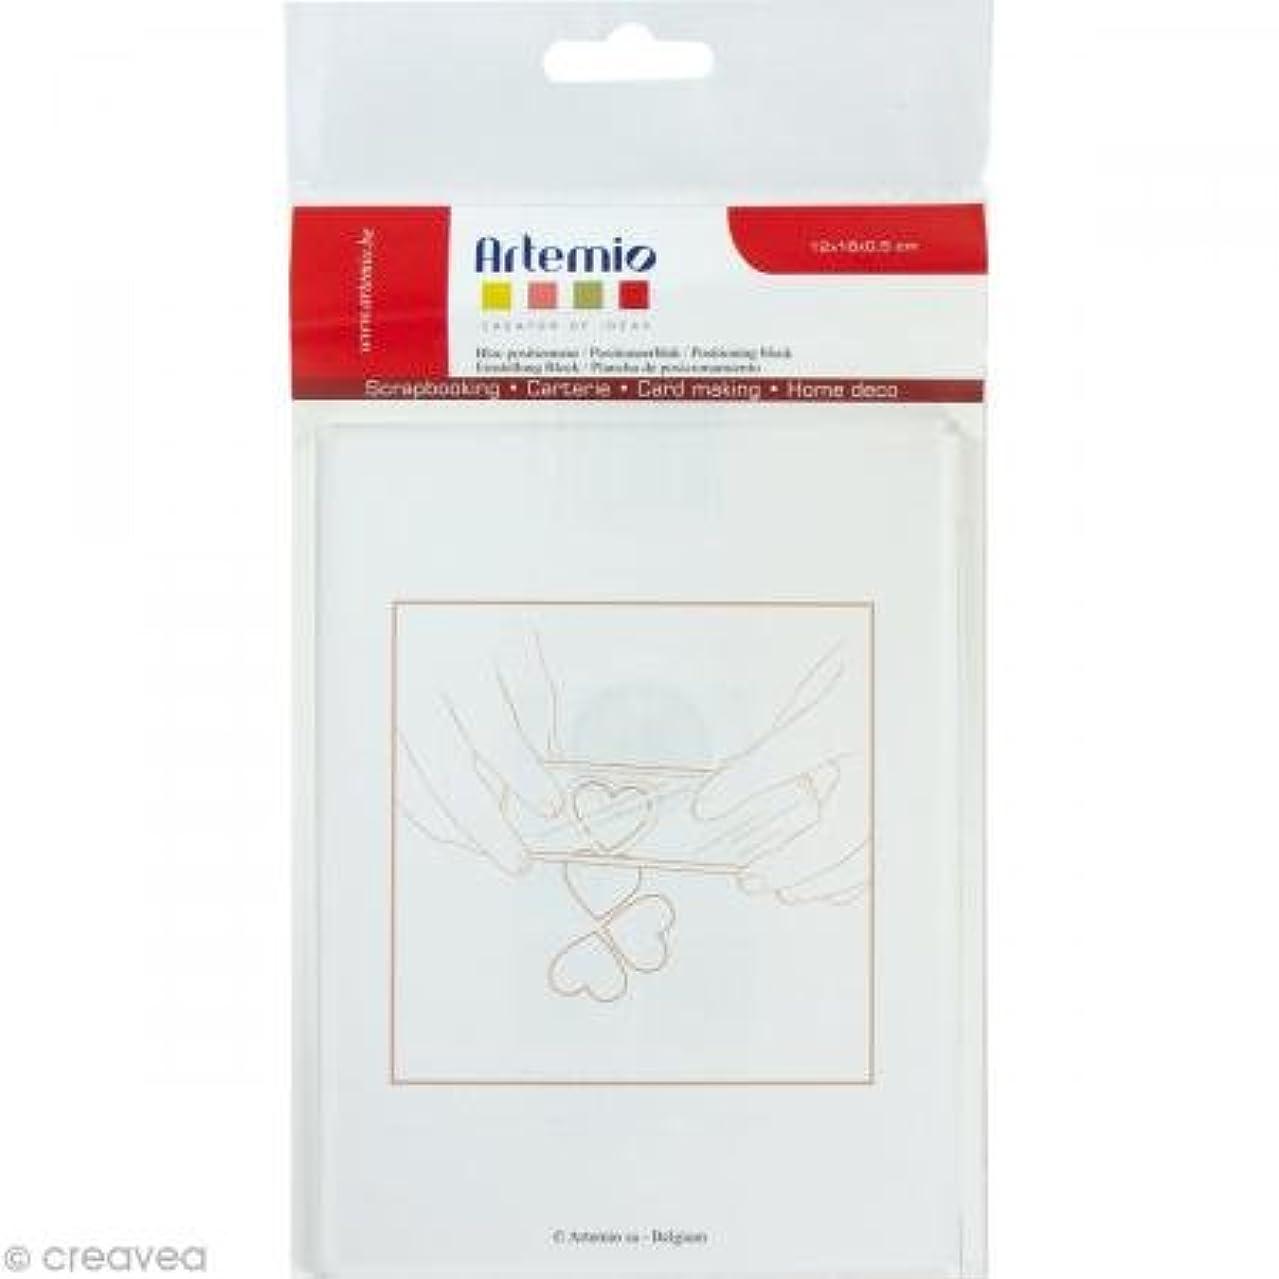 Artemio Positioning Stamping Block, Acrylic, White, 13.5?X 24.5?X 1.5?cm